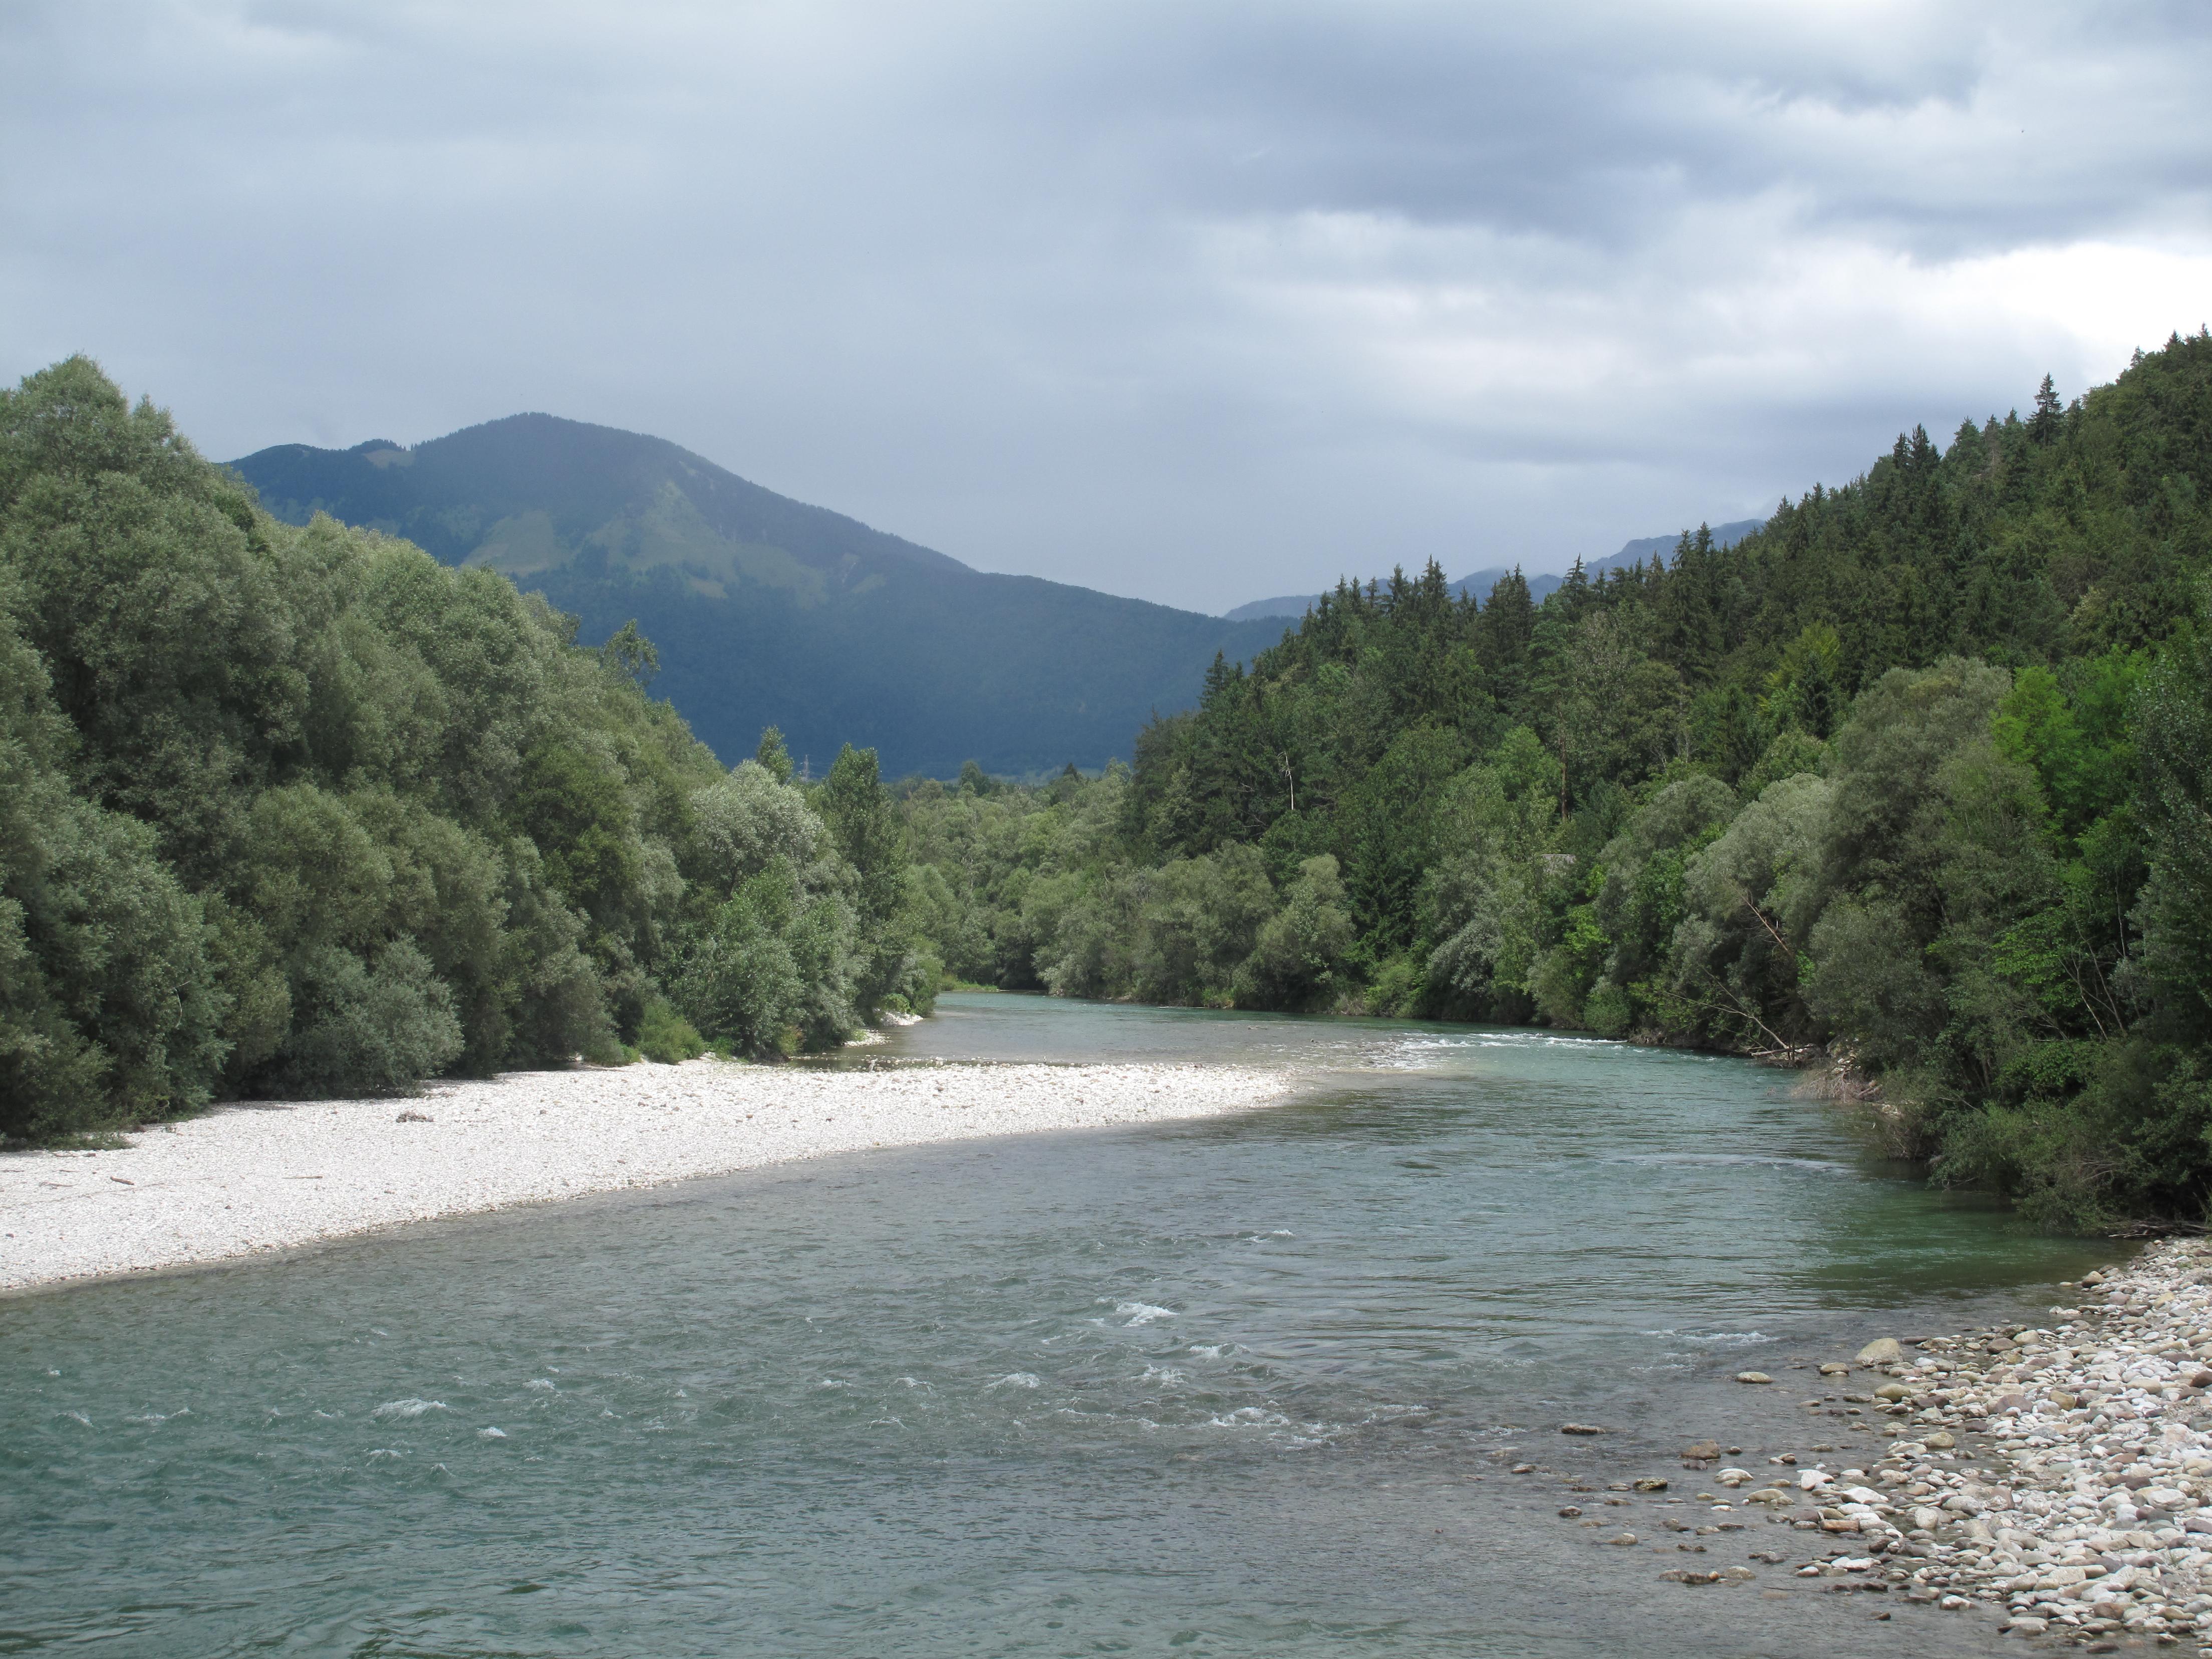 File:tussen gobovce en podnart, rivier foto2 2011-07-20 13.14